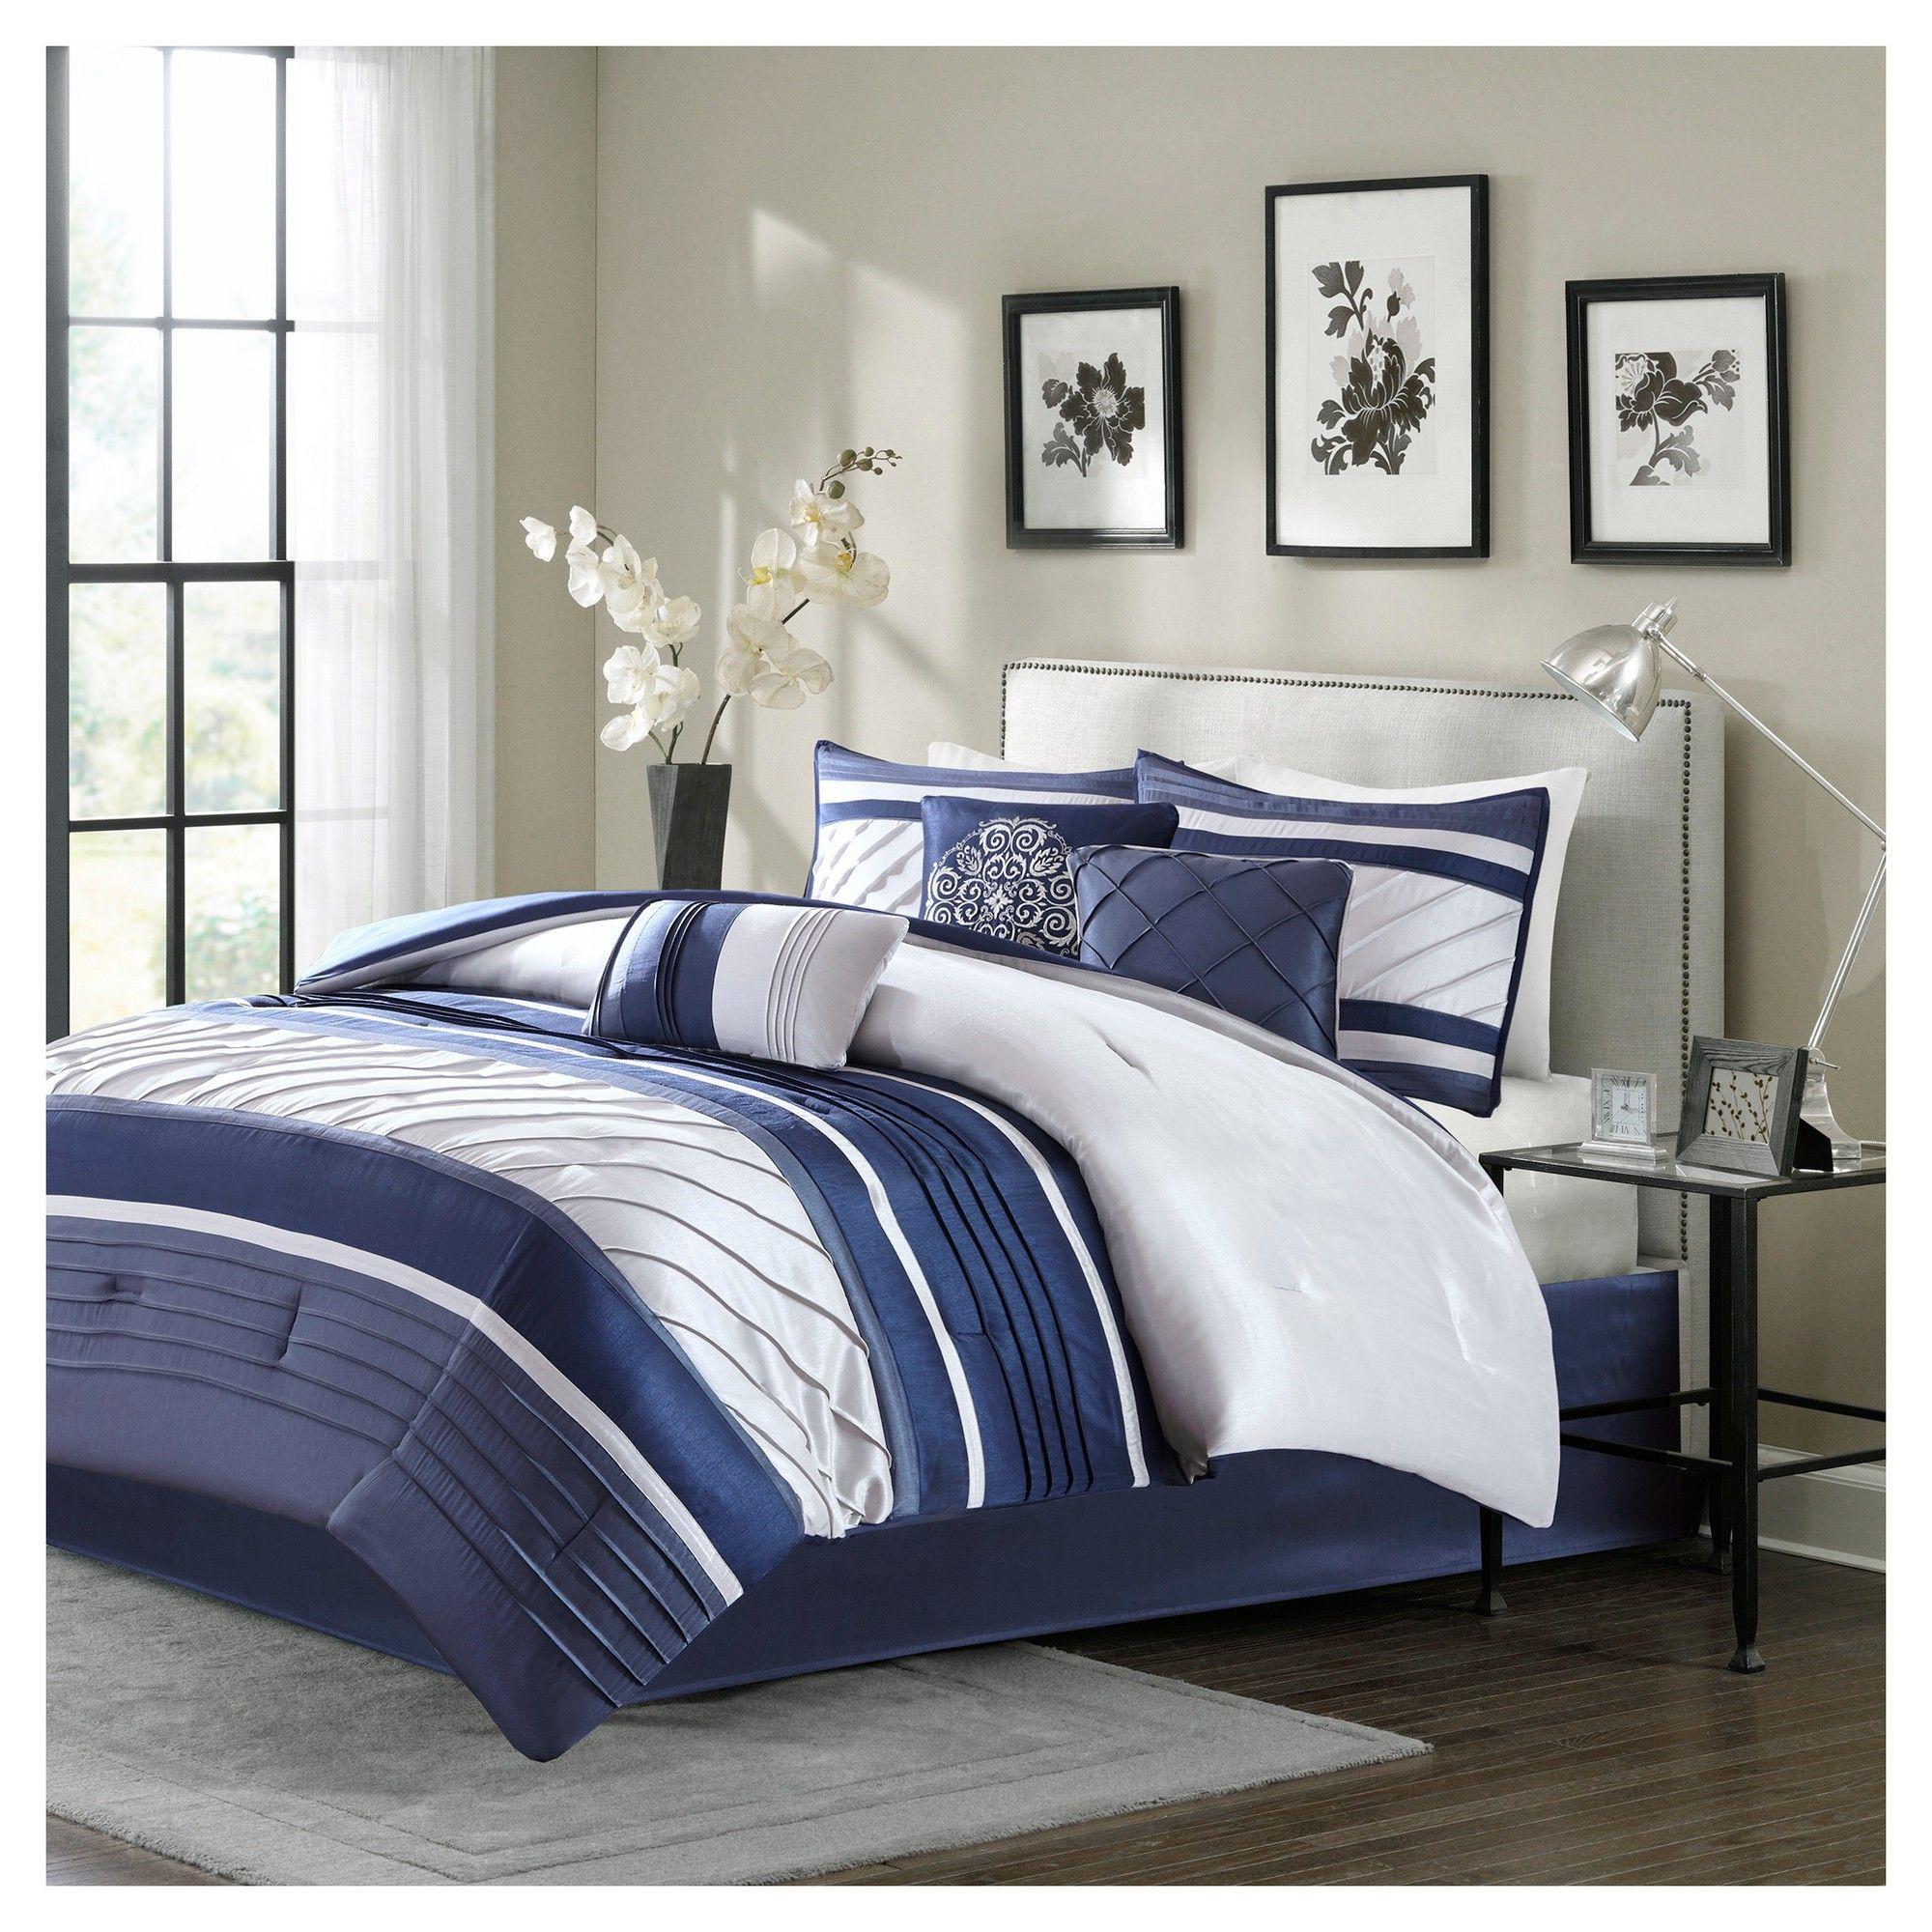 Navy Comforter Set California King 7pc, Blue